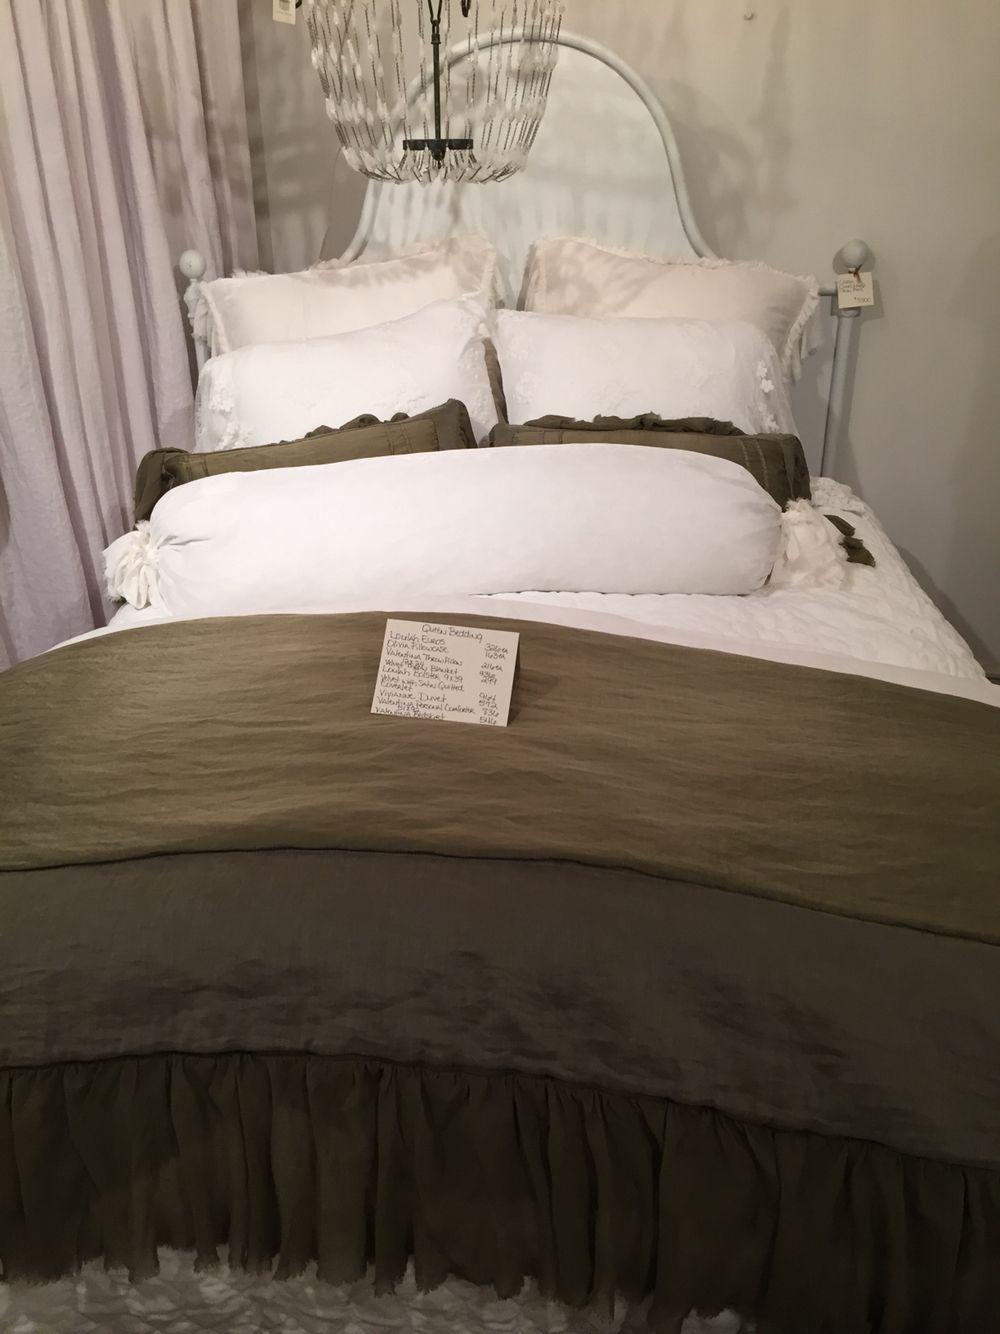 Bella notte bedding Bella notte bedding, Bed, Home decor